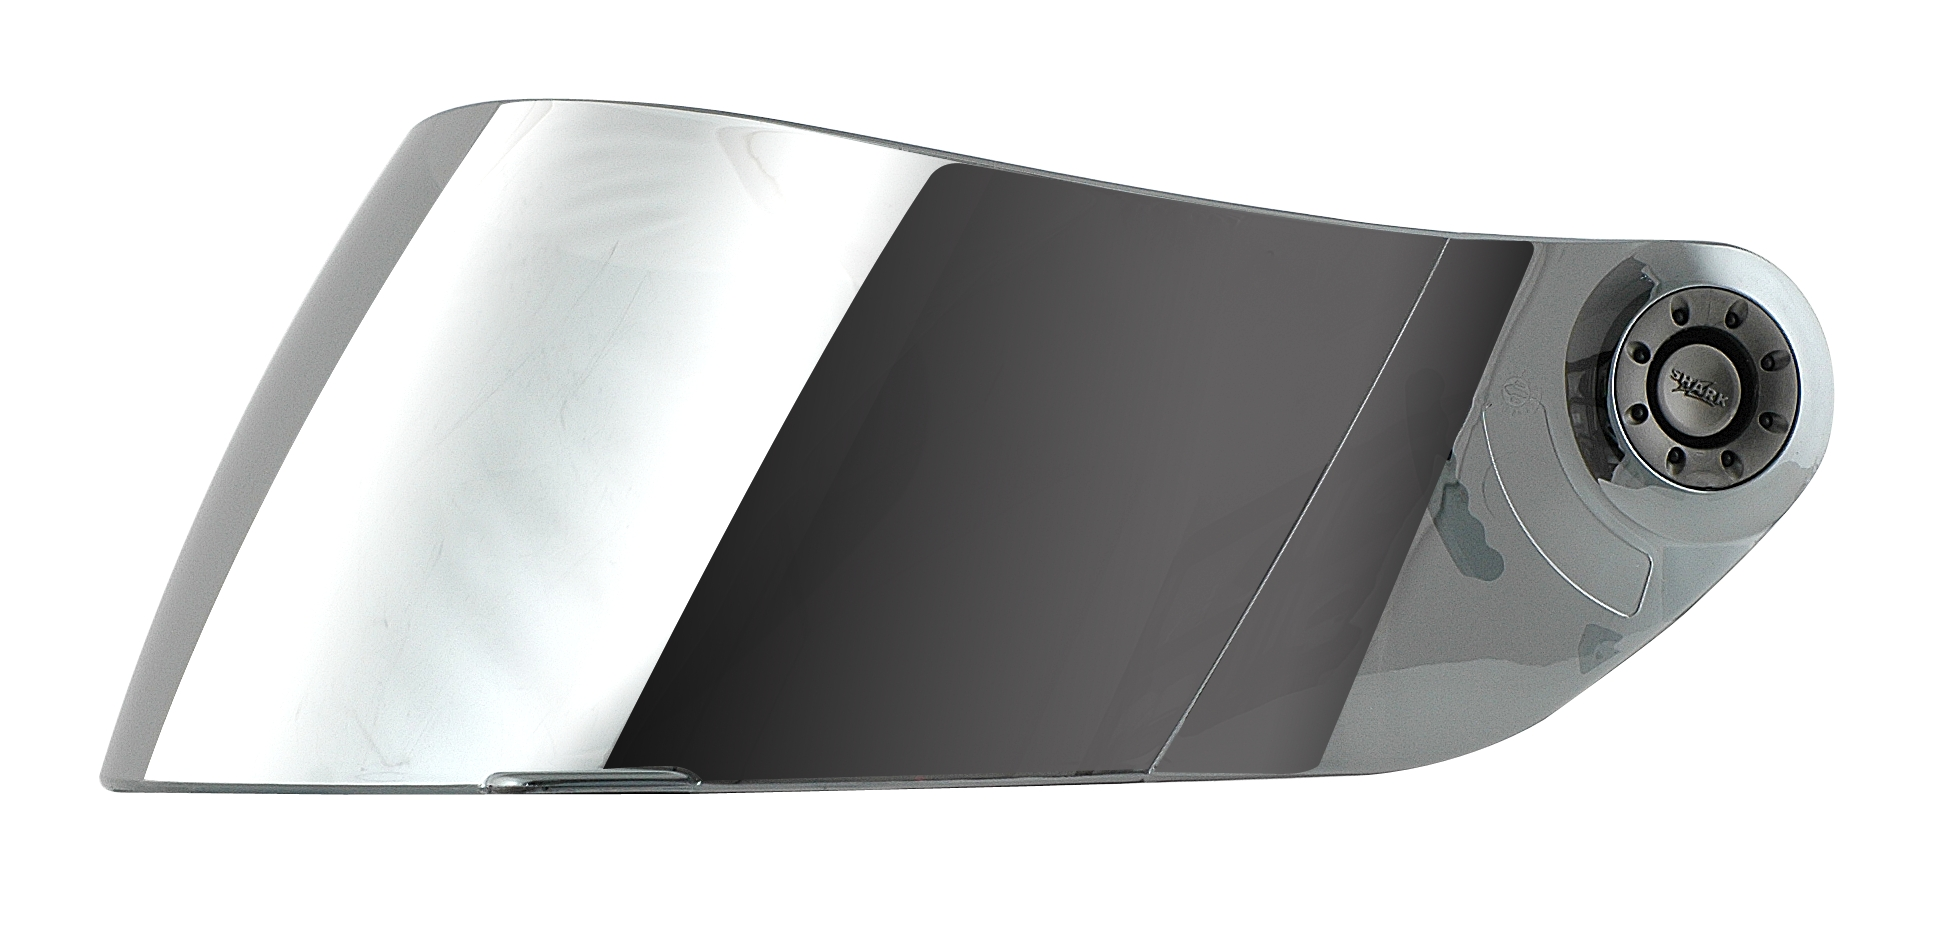 visier chrom verspiegelt shark ridill s900 c s700 s. Black Bedroom Furniture Sets. Home Design Ideas